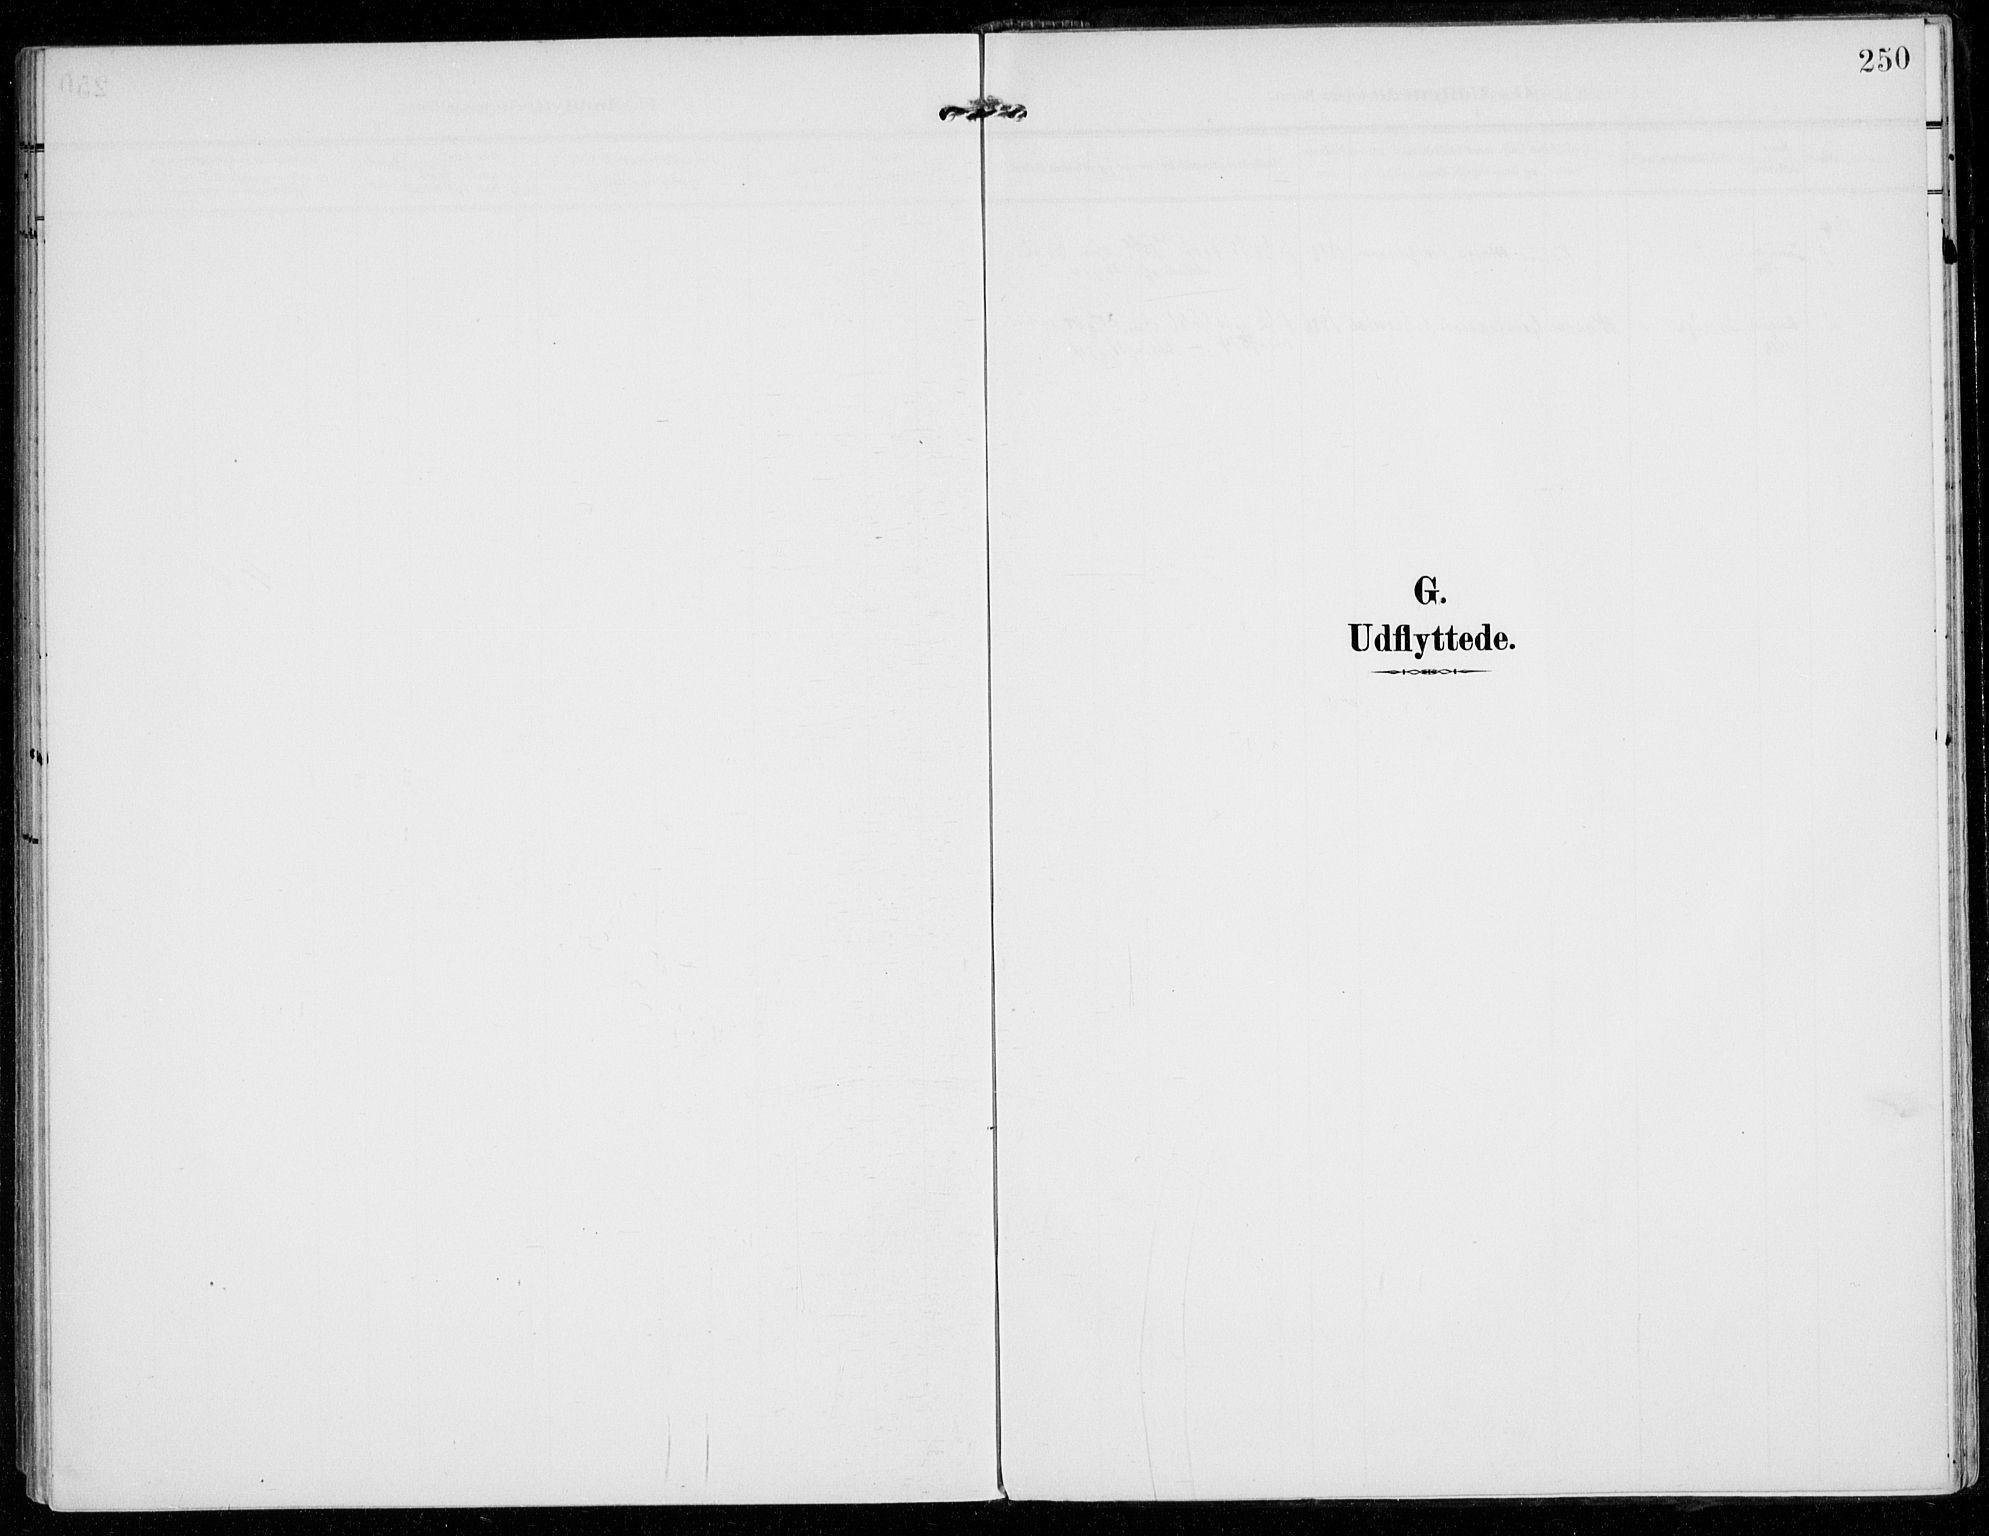 SAO, Vestby prestekontor Kirkebøker, F/Fc/L0002: Ministerialbok nr. III 2, 1906-1940, s. 250